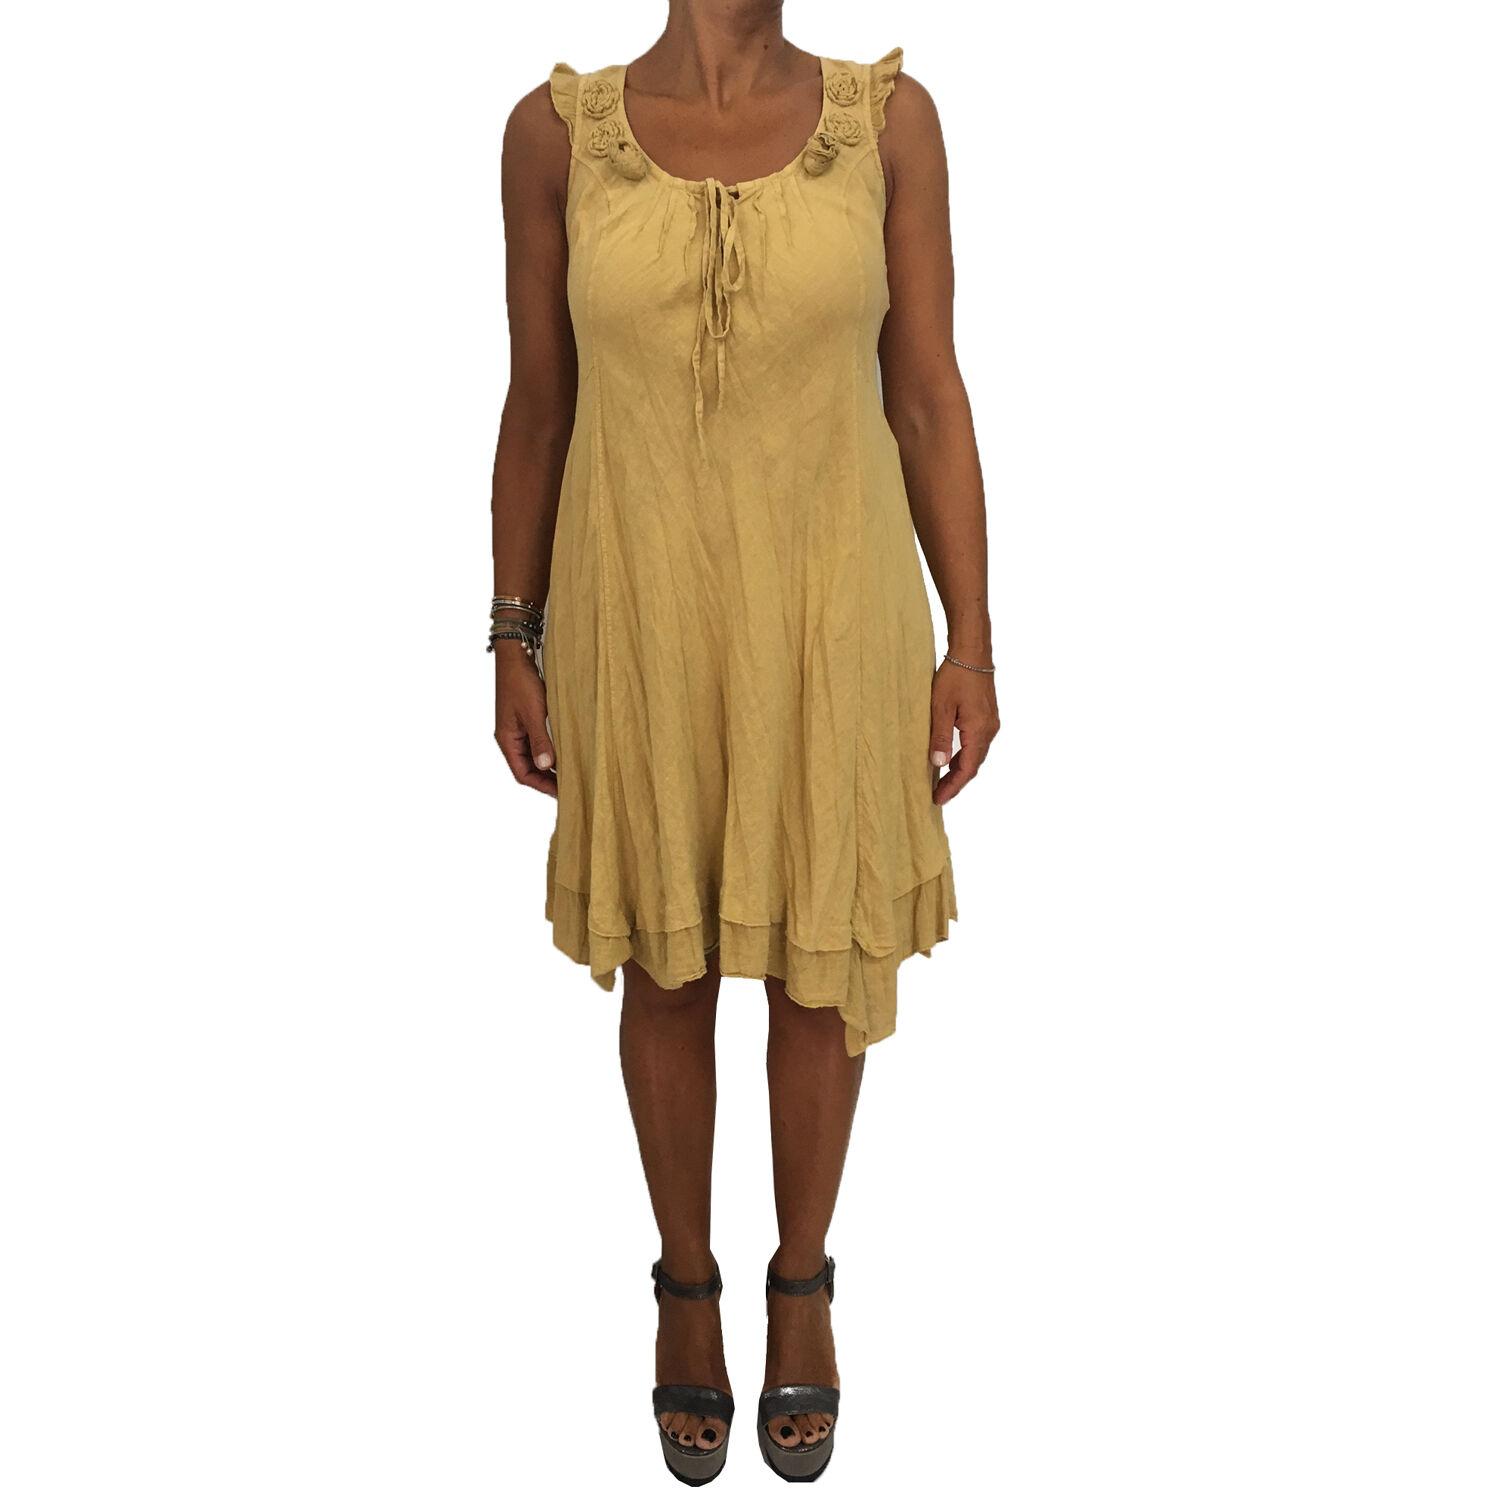 LA FEE MARABOUTEE women's dress yellow 100% linen MADE IN ITALY IT M-44 FR-40